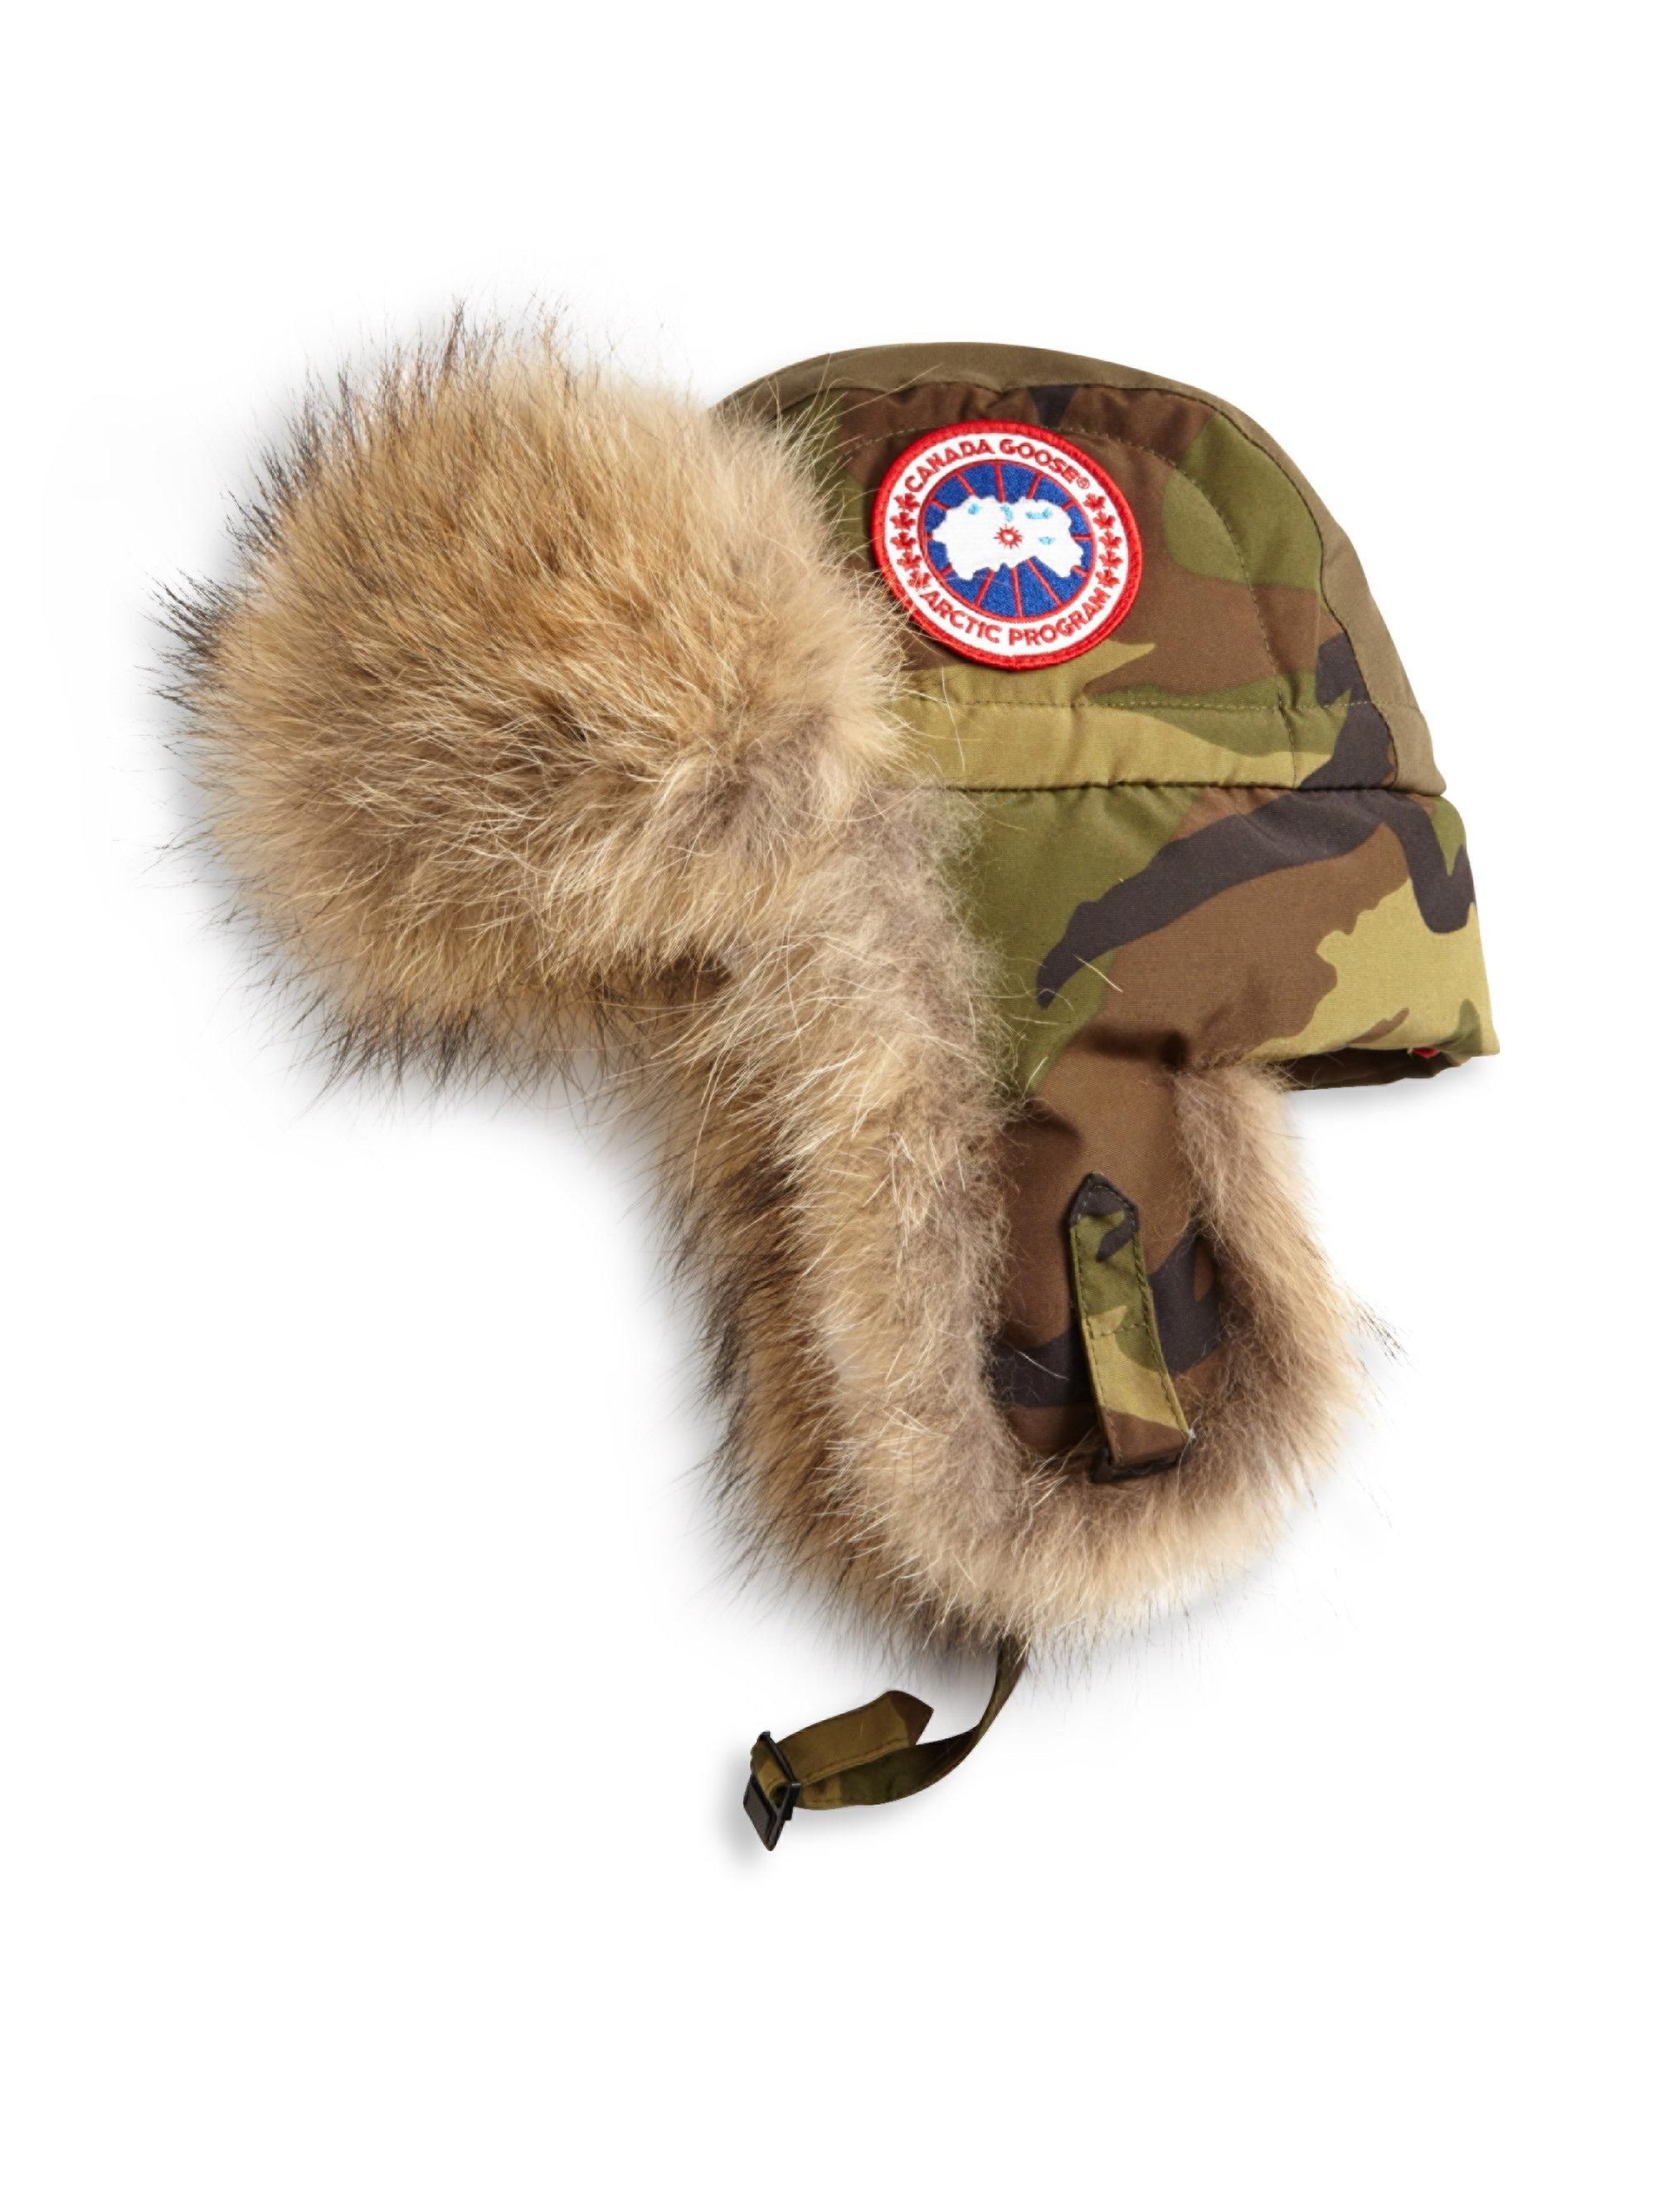 85ea7894122 Canada Goose Aviator Hat Uk